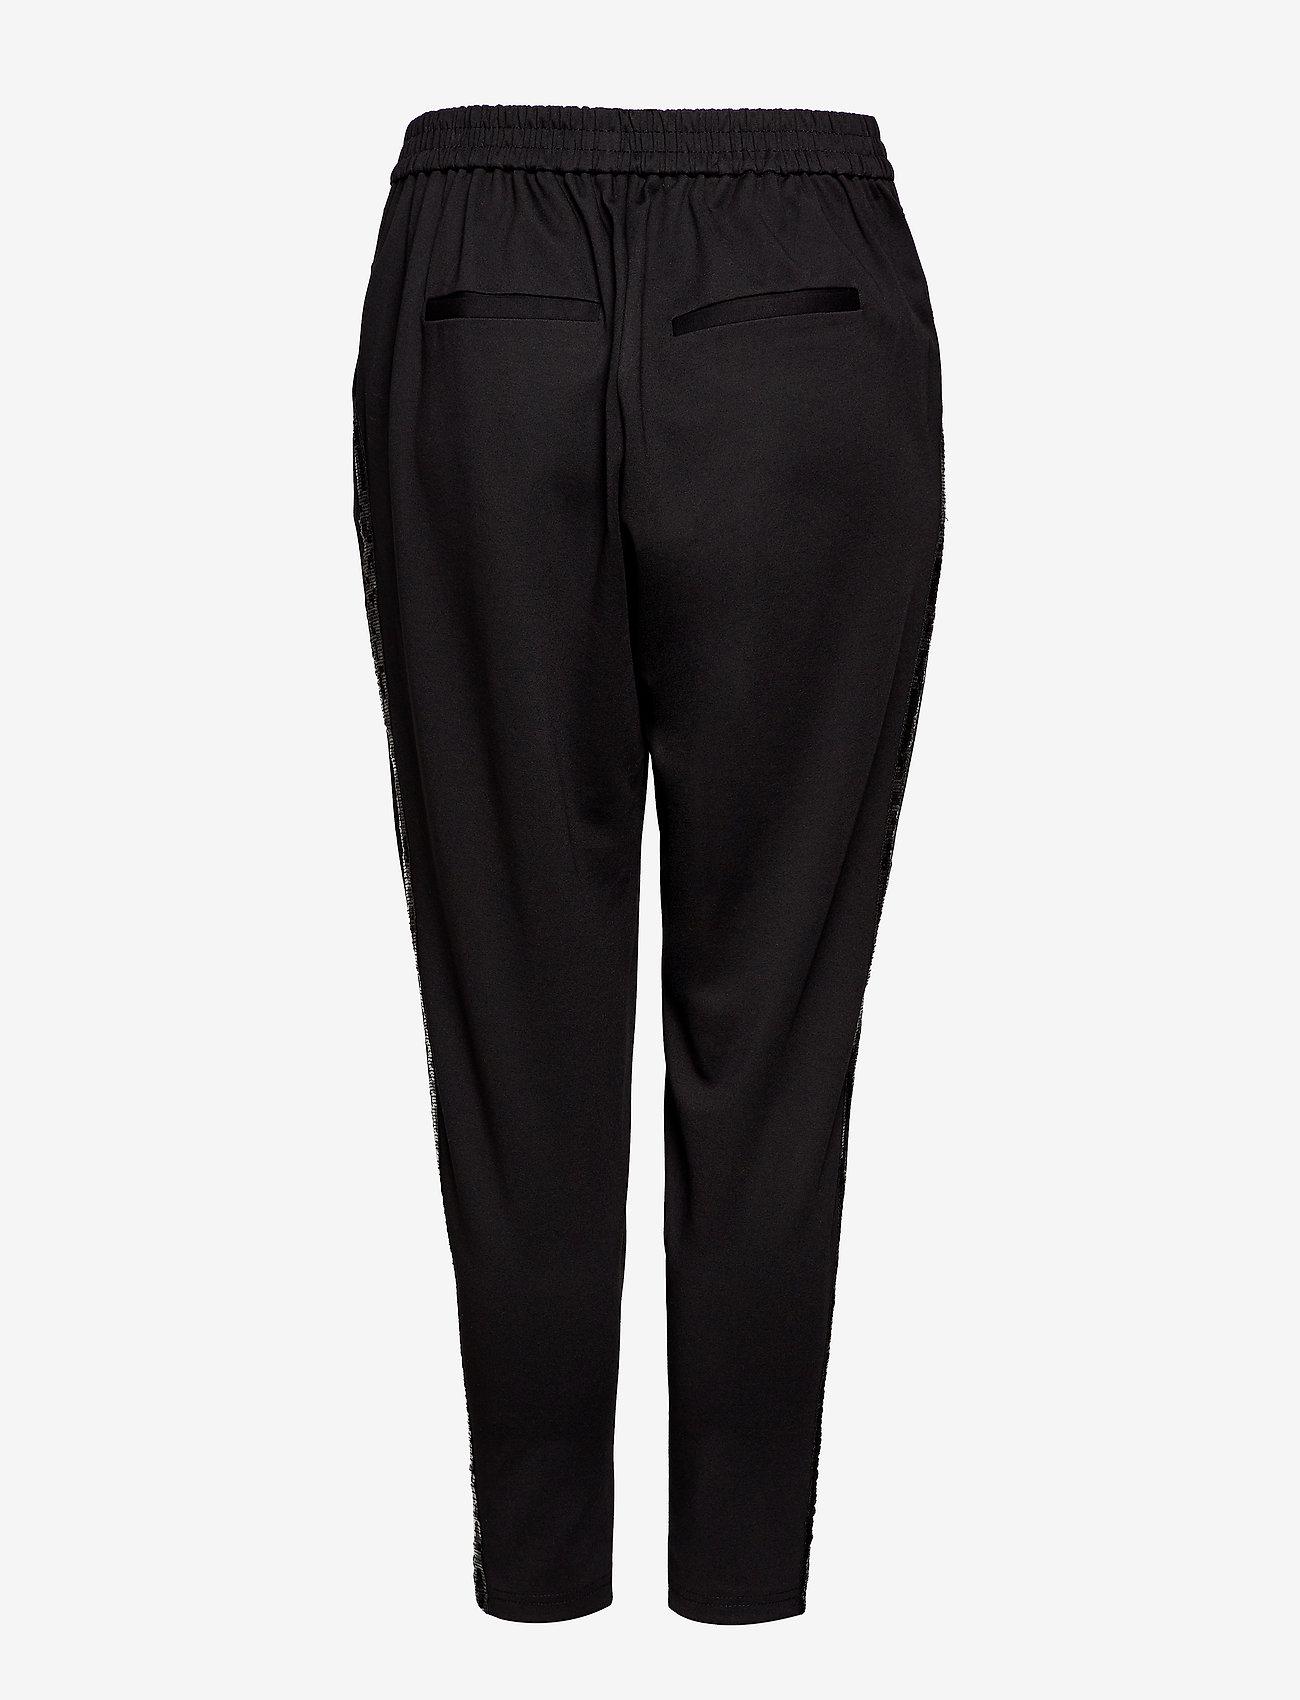 Särskild rabattTrousers Cropped Plus Size Stretch 7/8 Lenght Black 299.97 Zizzi YsSuW uK9x4